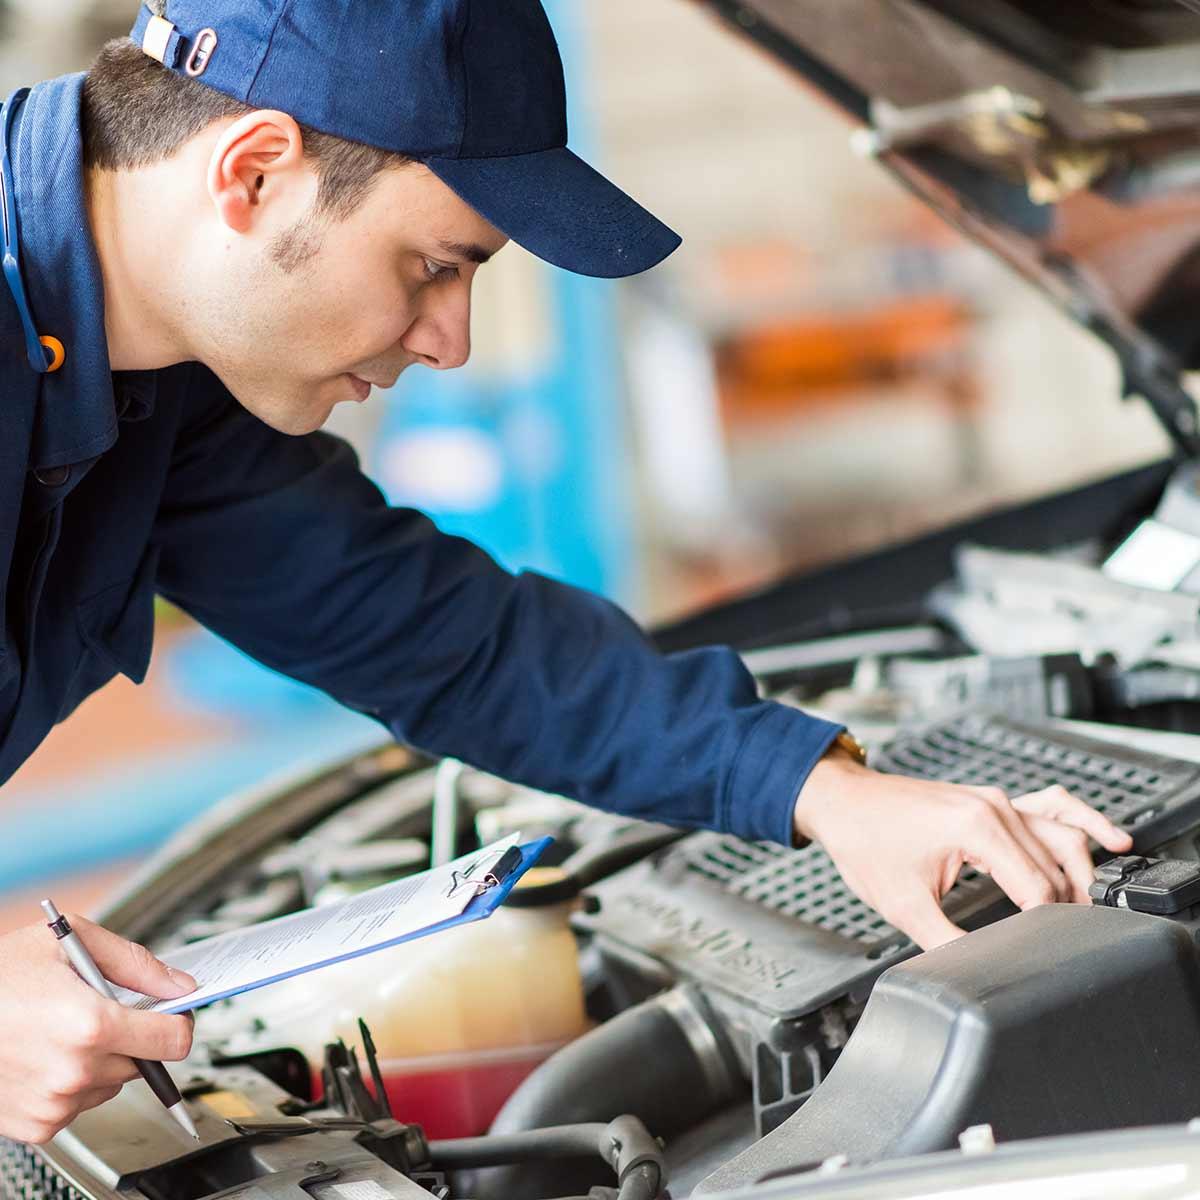 Engine is shaking or vibrating inspection | AutoGuru